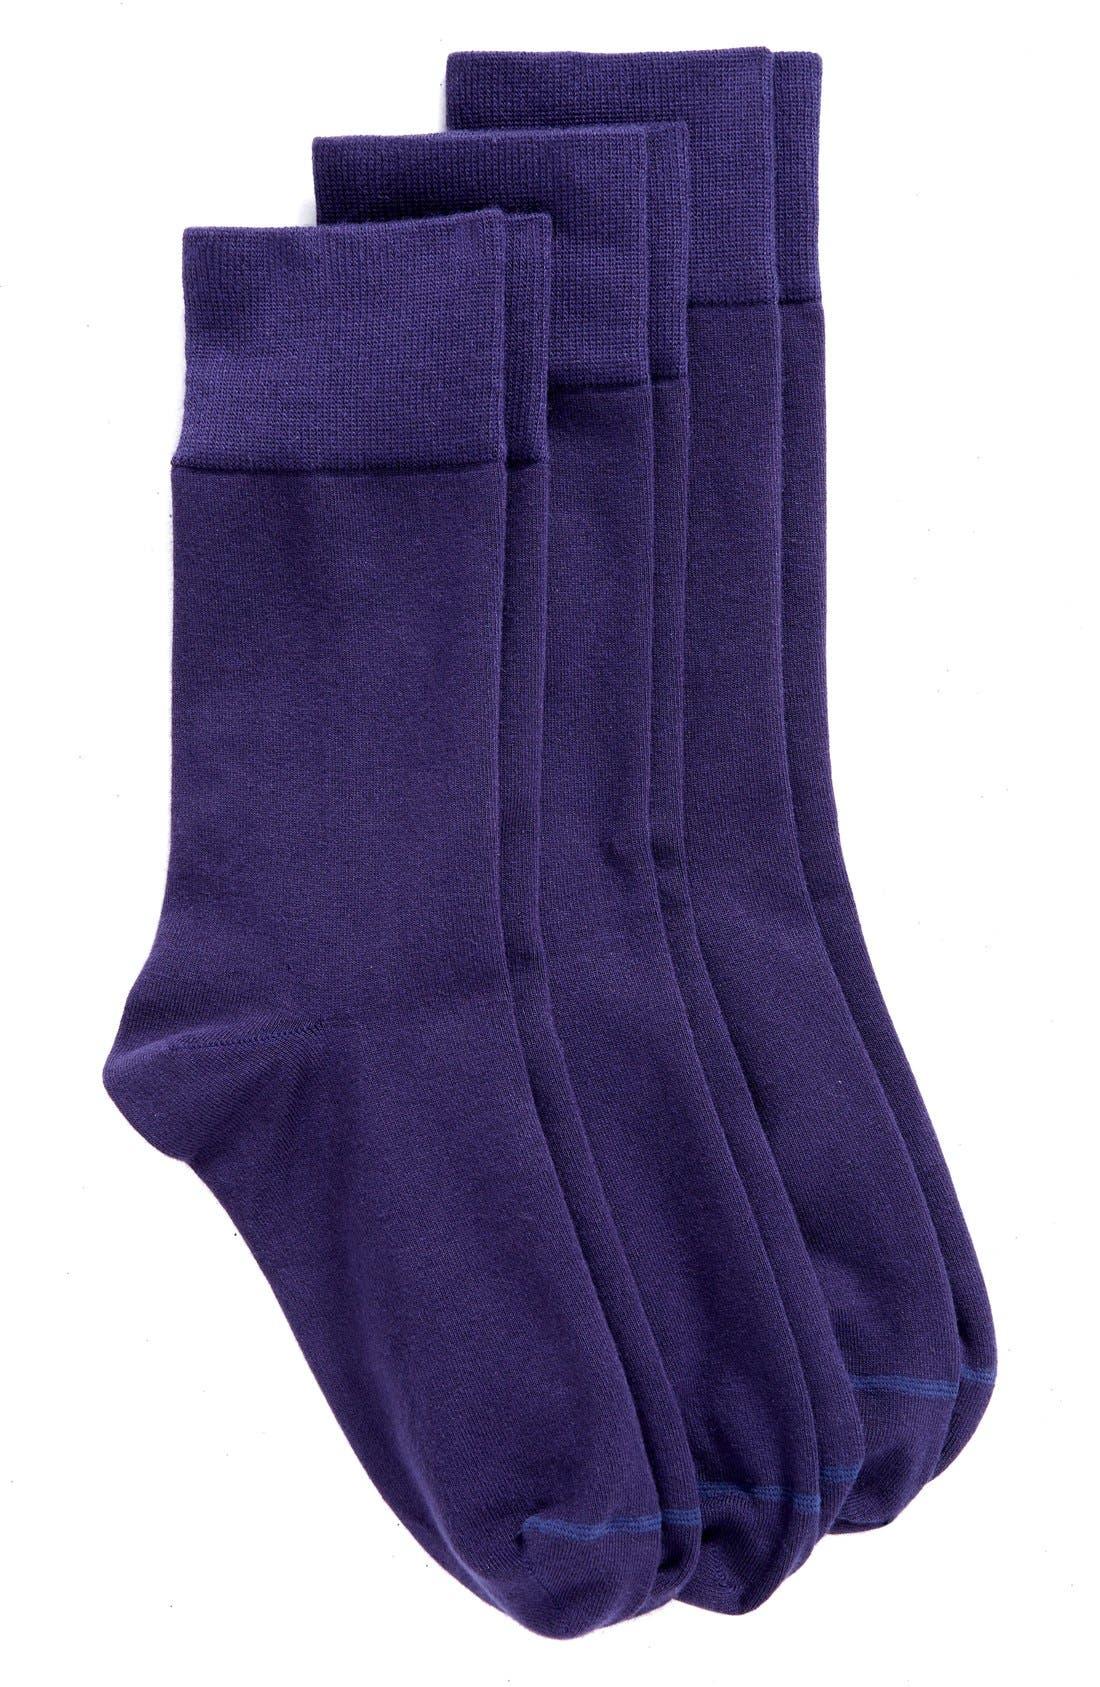 NORDSTROM, Crew Socks, Main thumbnail 1, color, NAVY